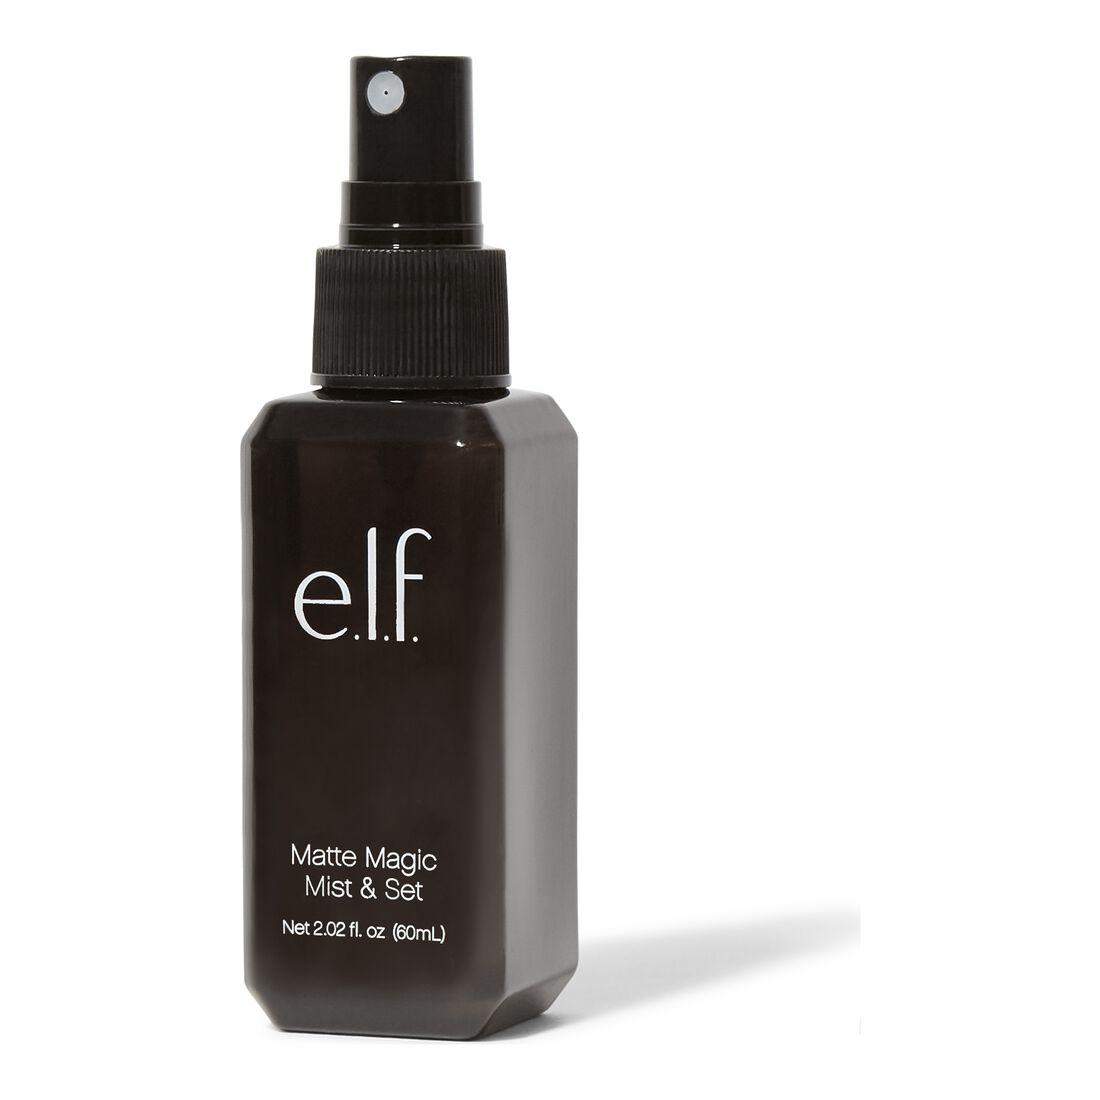 ELF Cosmetics - Matte Magic Mist & Set - Small